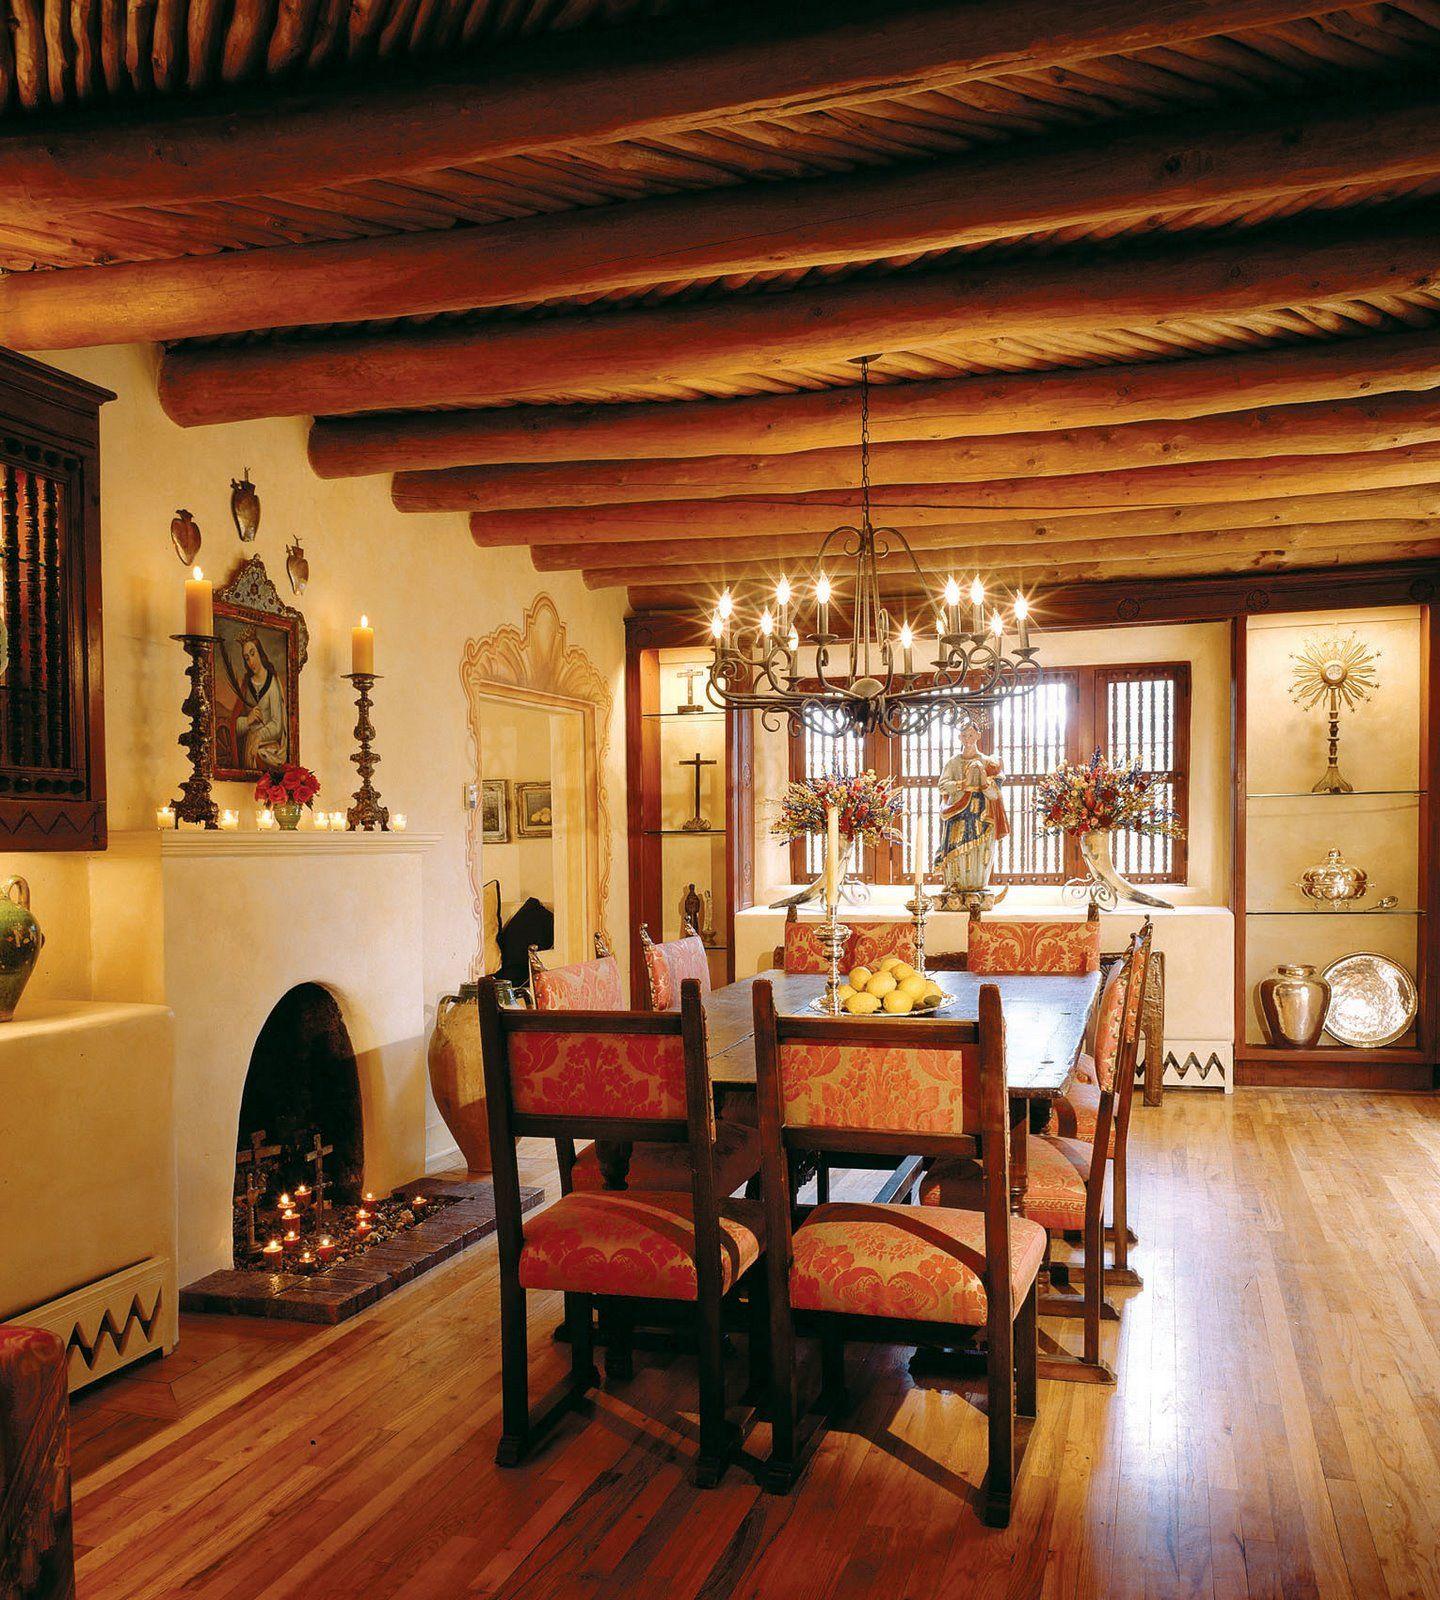 Jane Smith Room Jpg Image Spanish Colonial Decor Hacienda Style Homes Southwestern Home